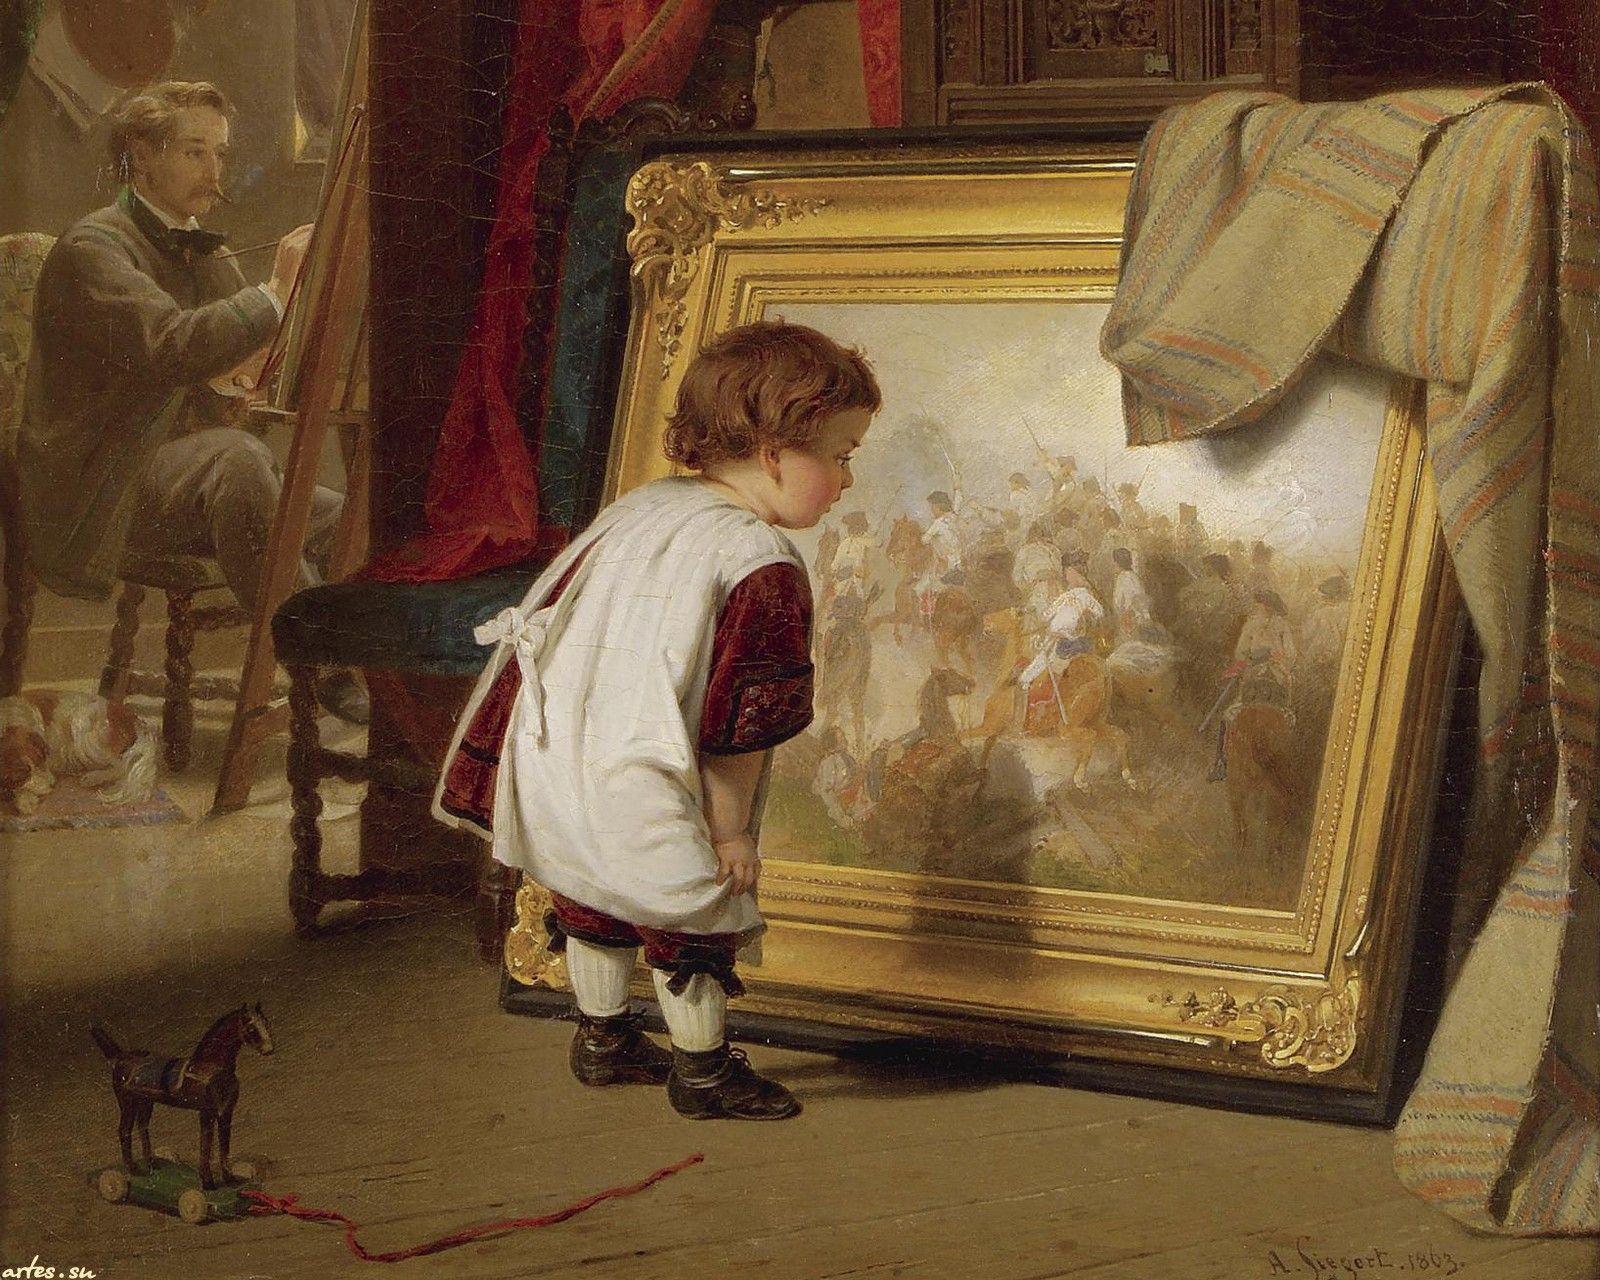 Descarga niños papel pintado, pequeño conocedor pintura, agosto ...